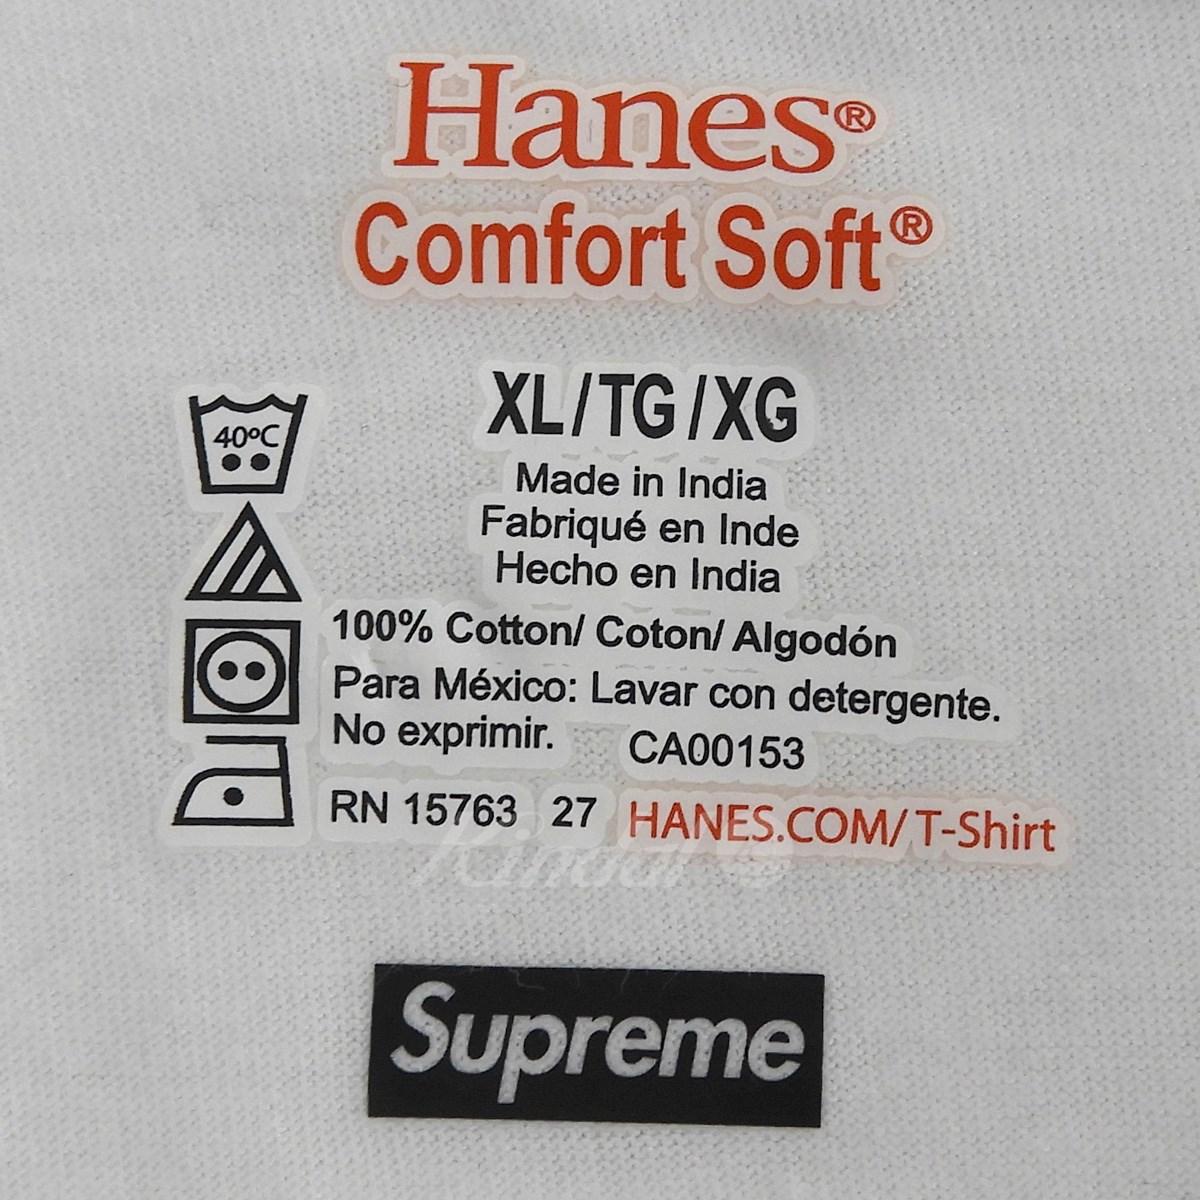 a9587aefbd79 kindal: Supreme X Hanes